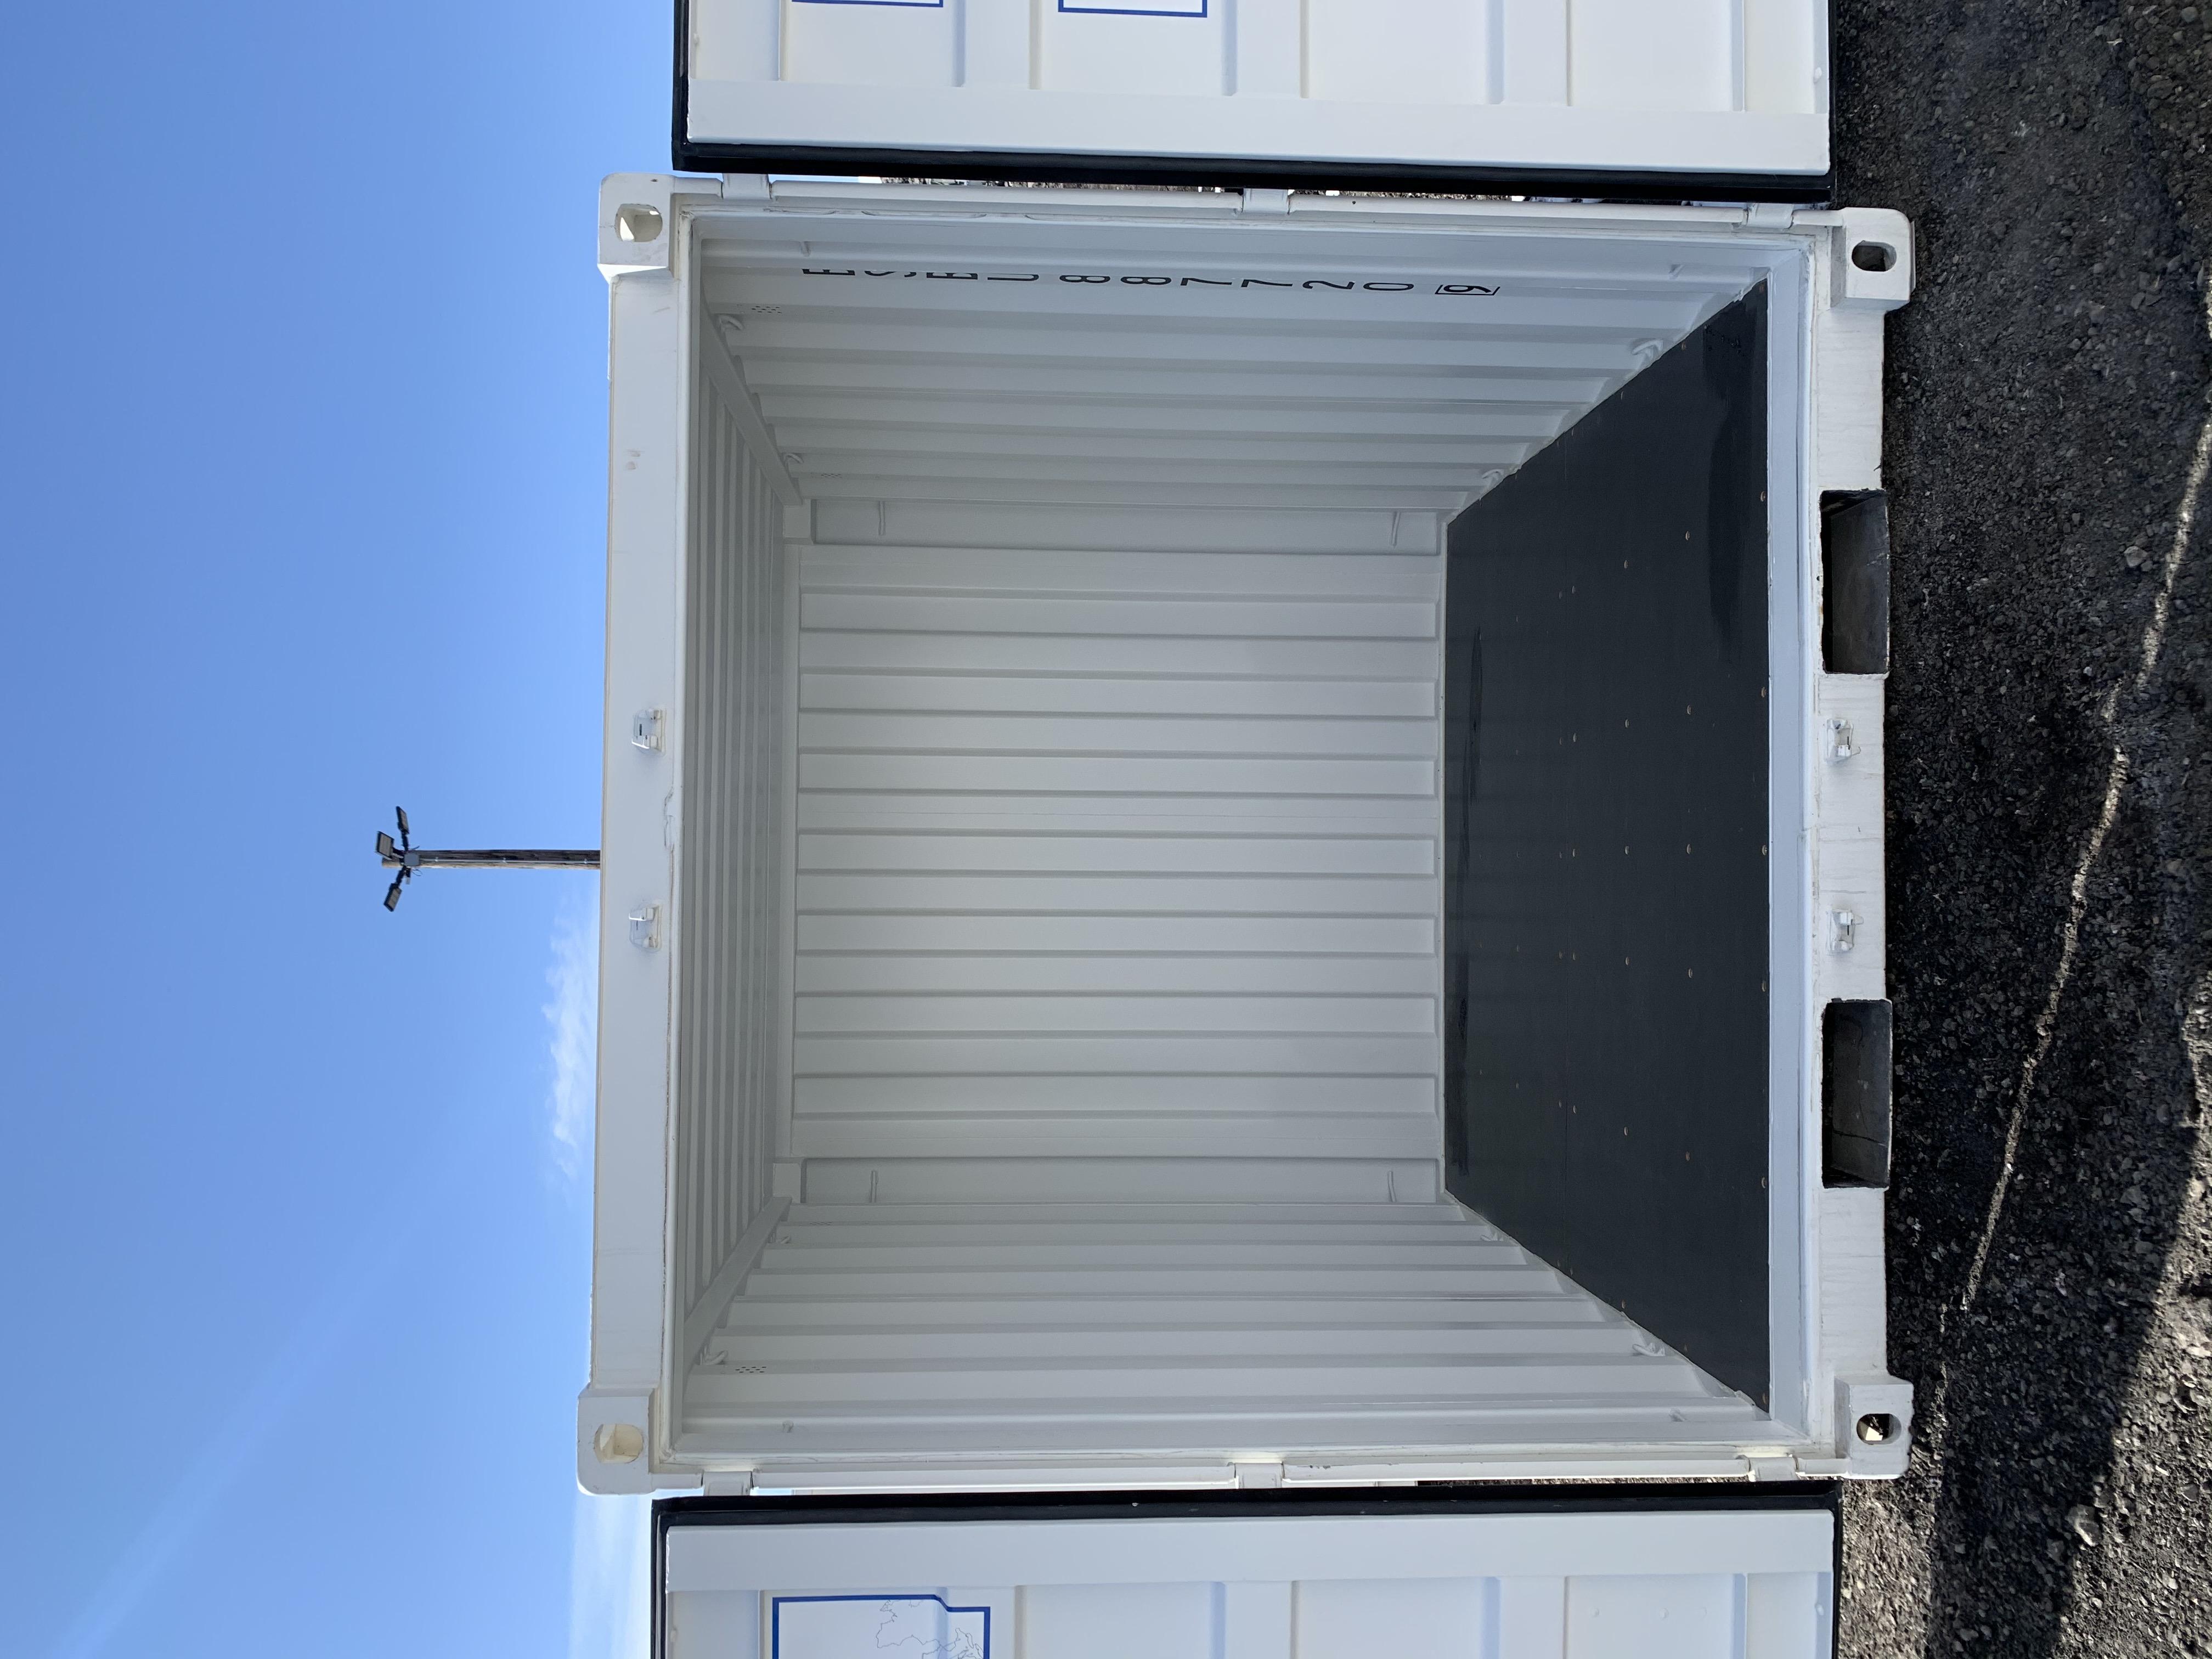 8x8 Storage Unit Calgary, AB